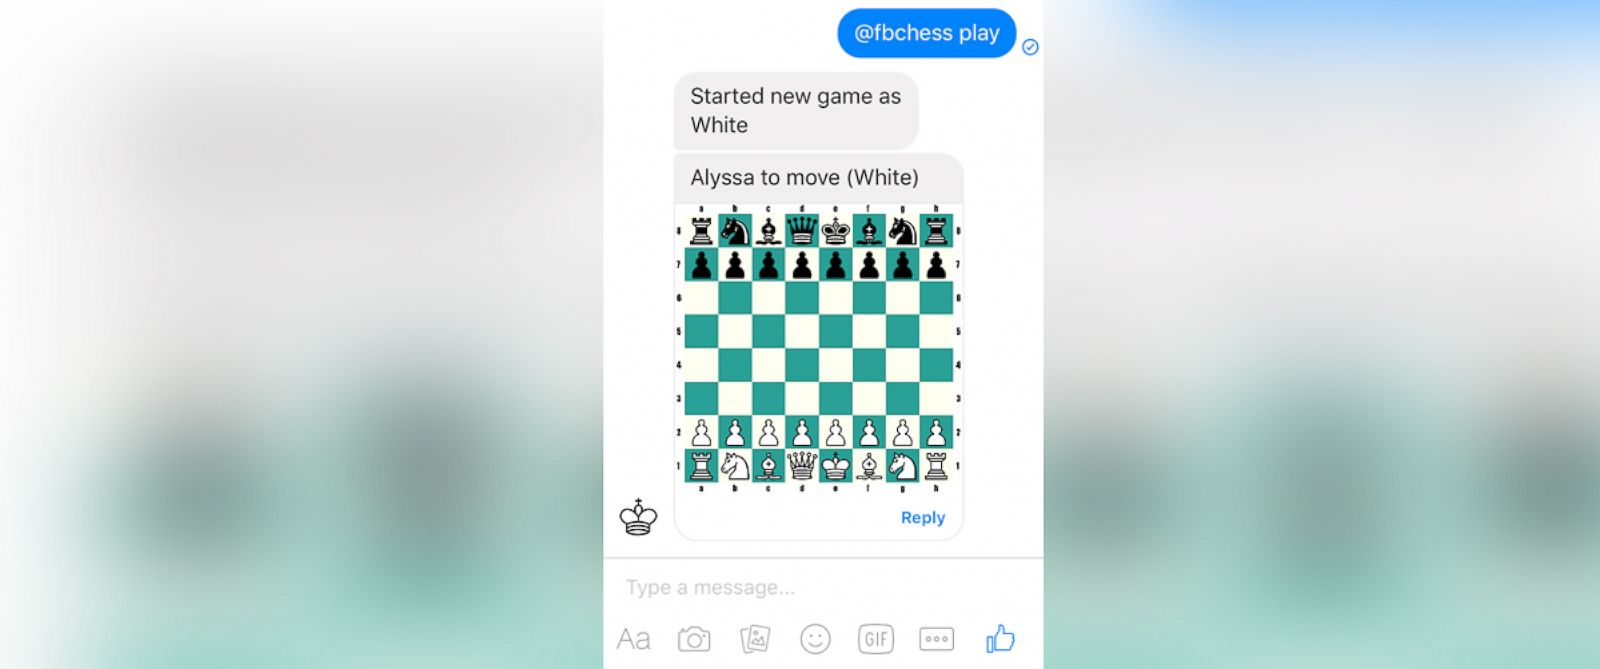 Good Morning America Zuckerberg Give Away : Facebook messenger includes a hidden chess game abc news